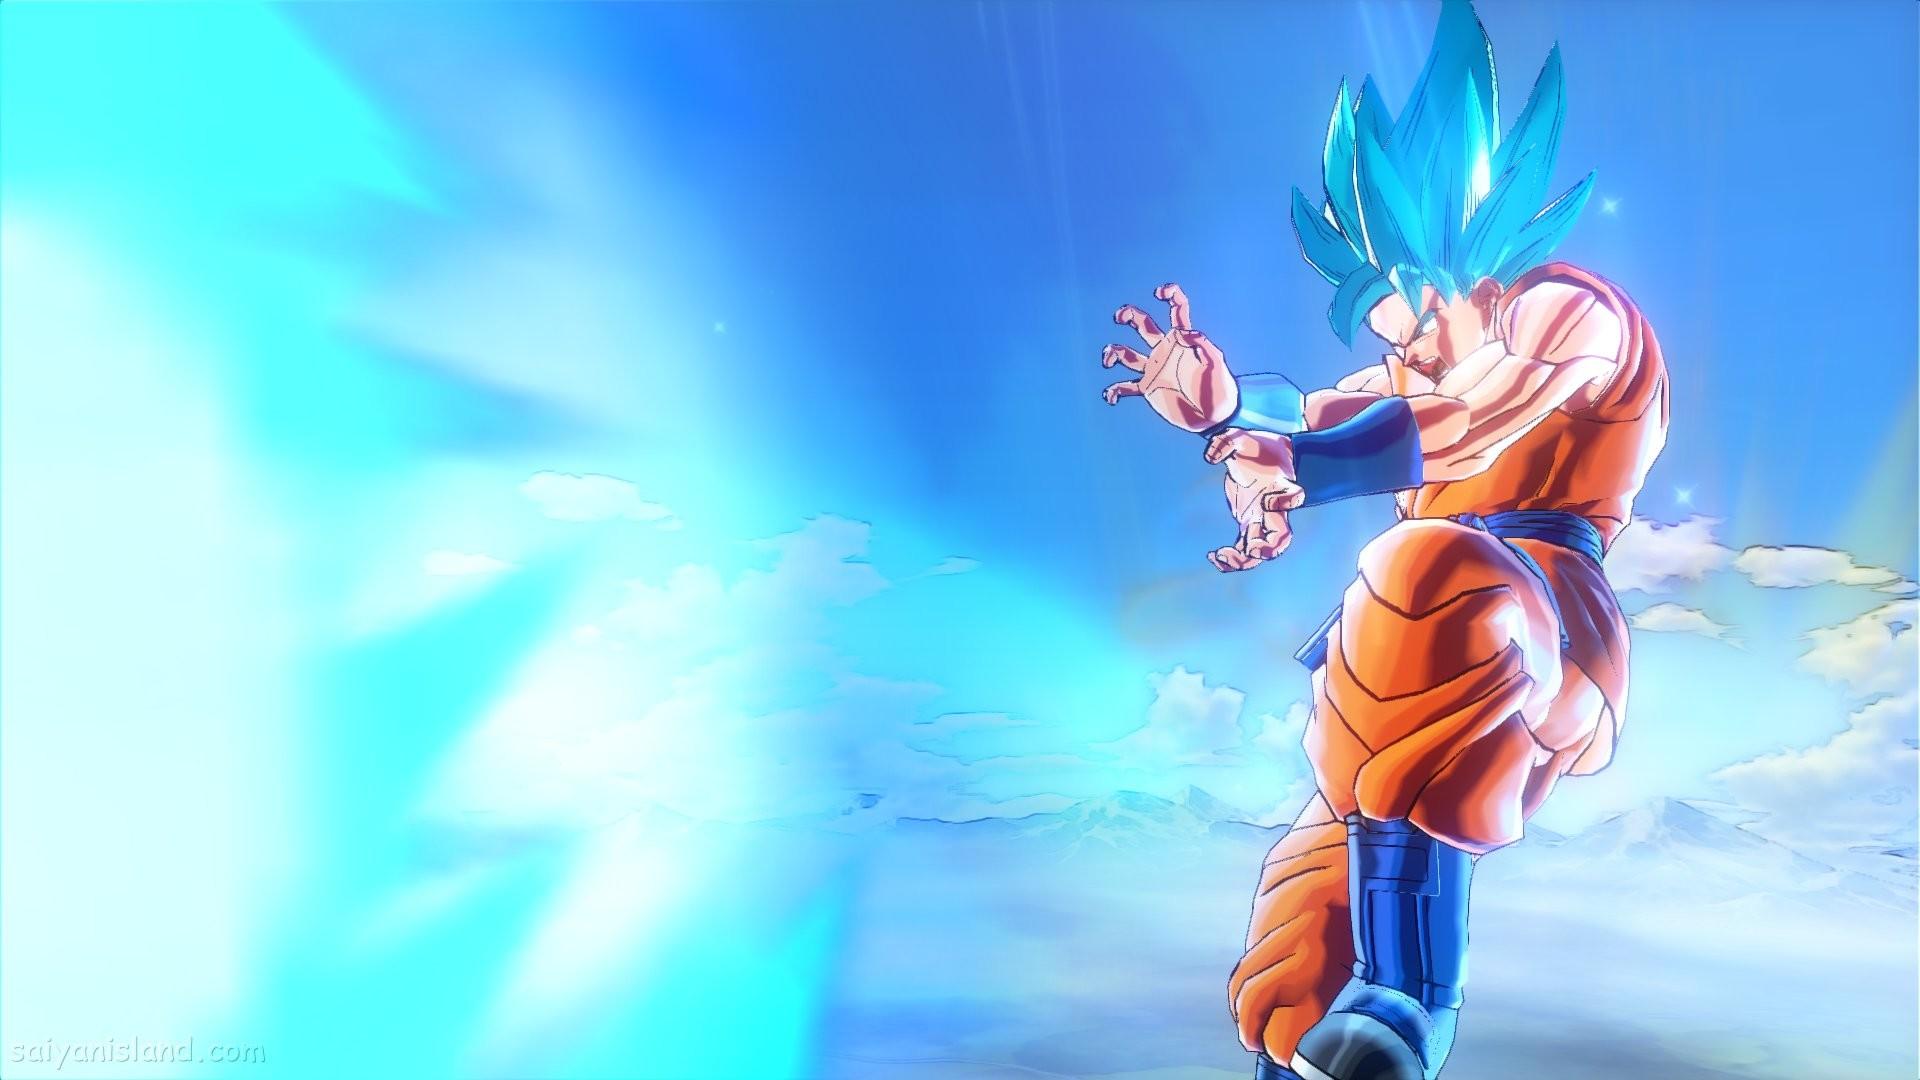 DBZ Wallpaper Goku (65+ images)